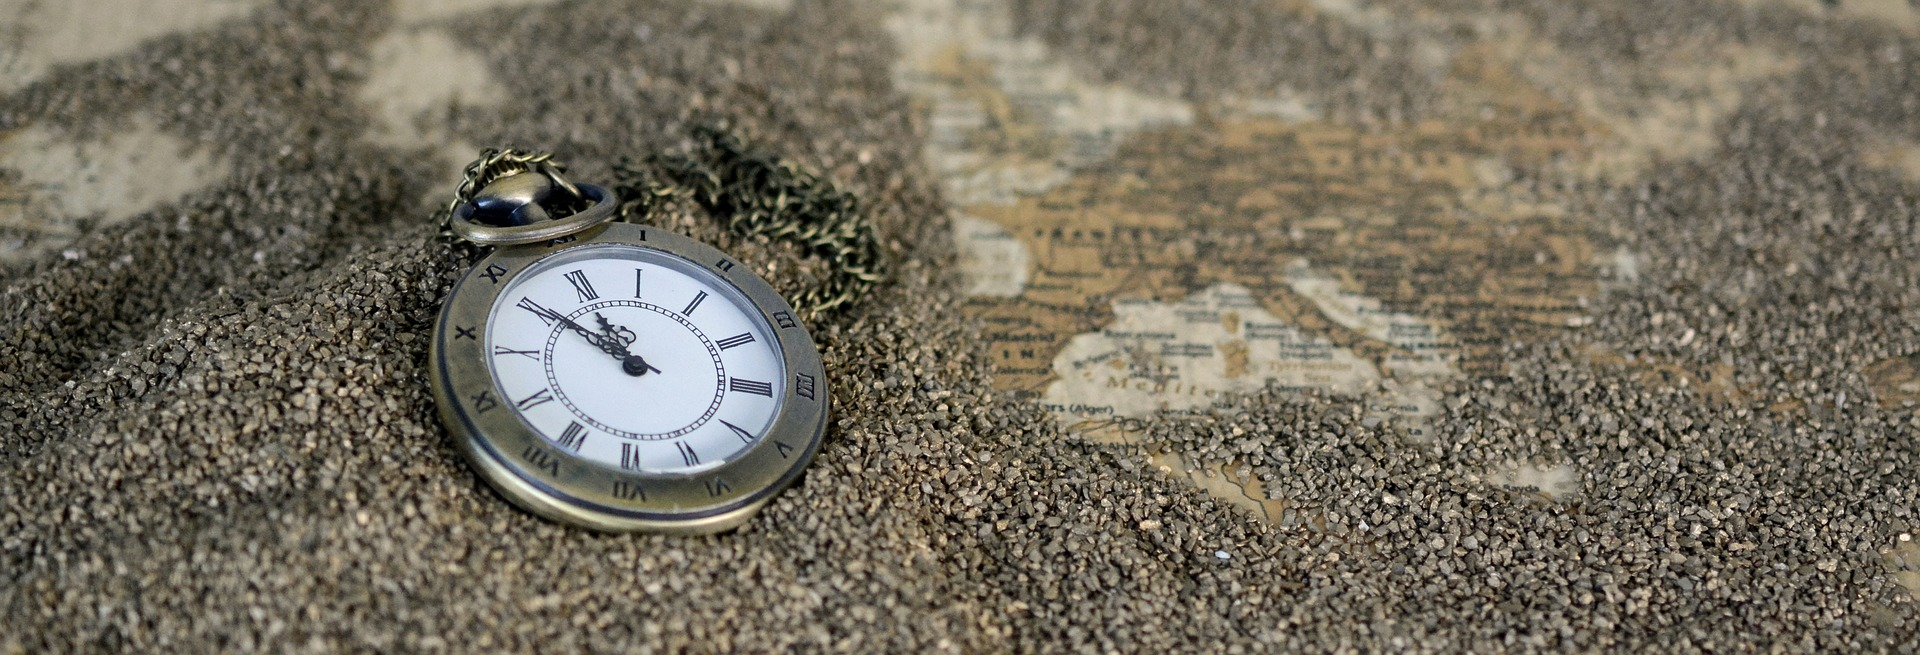 Time pocket-watch-1637396_1920